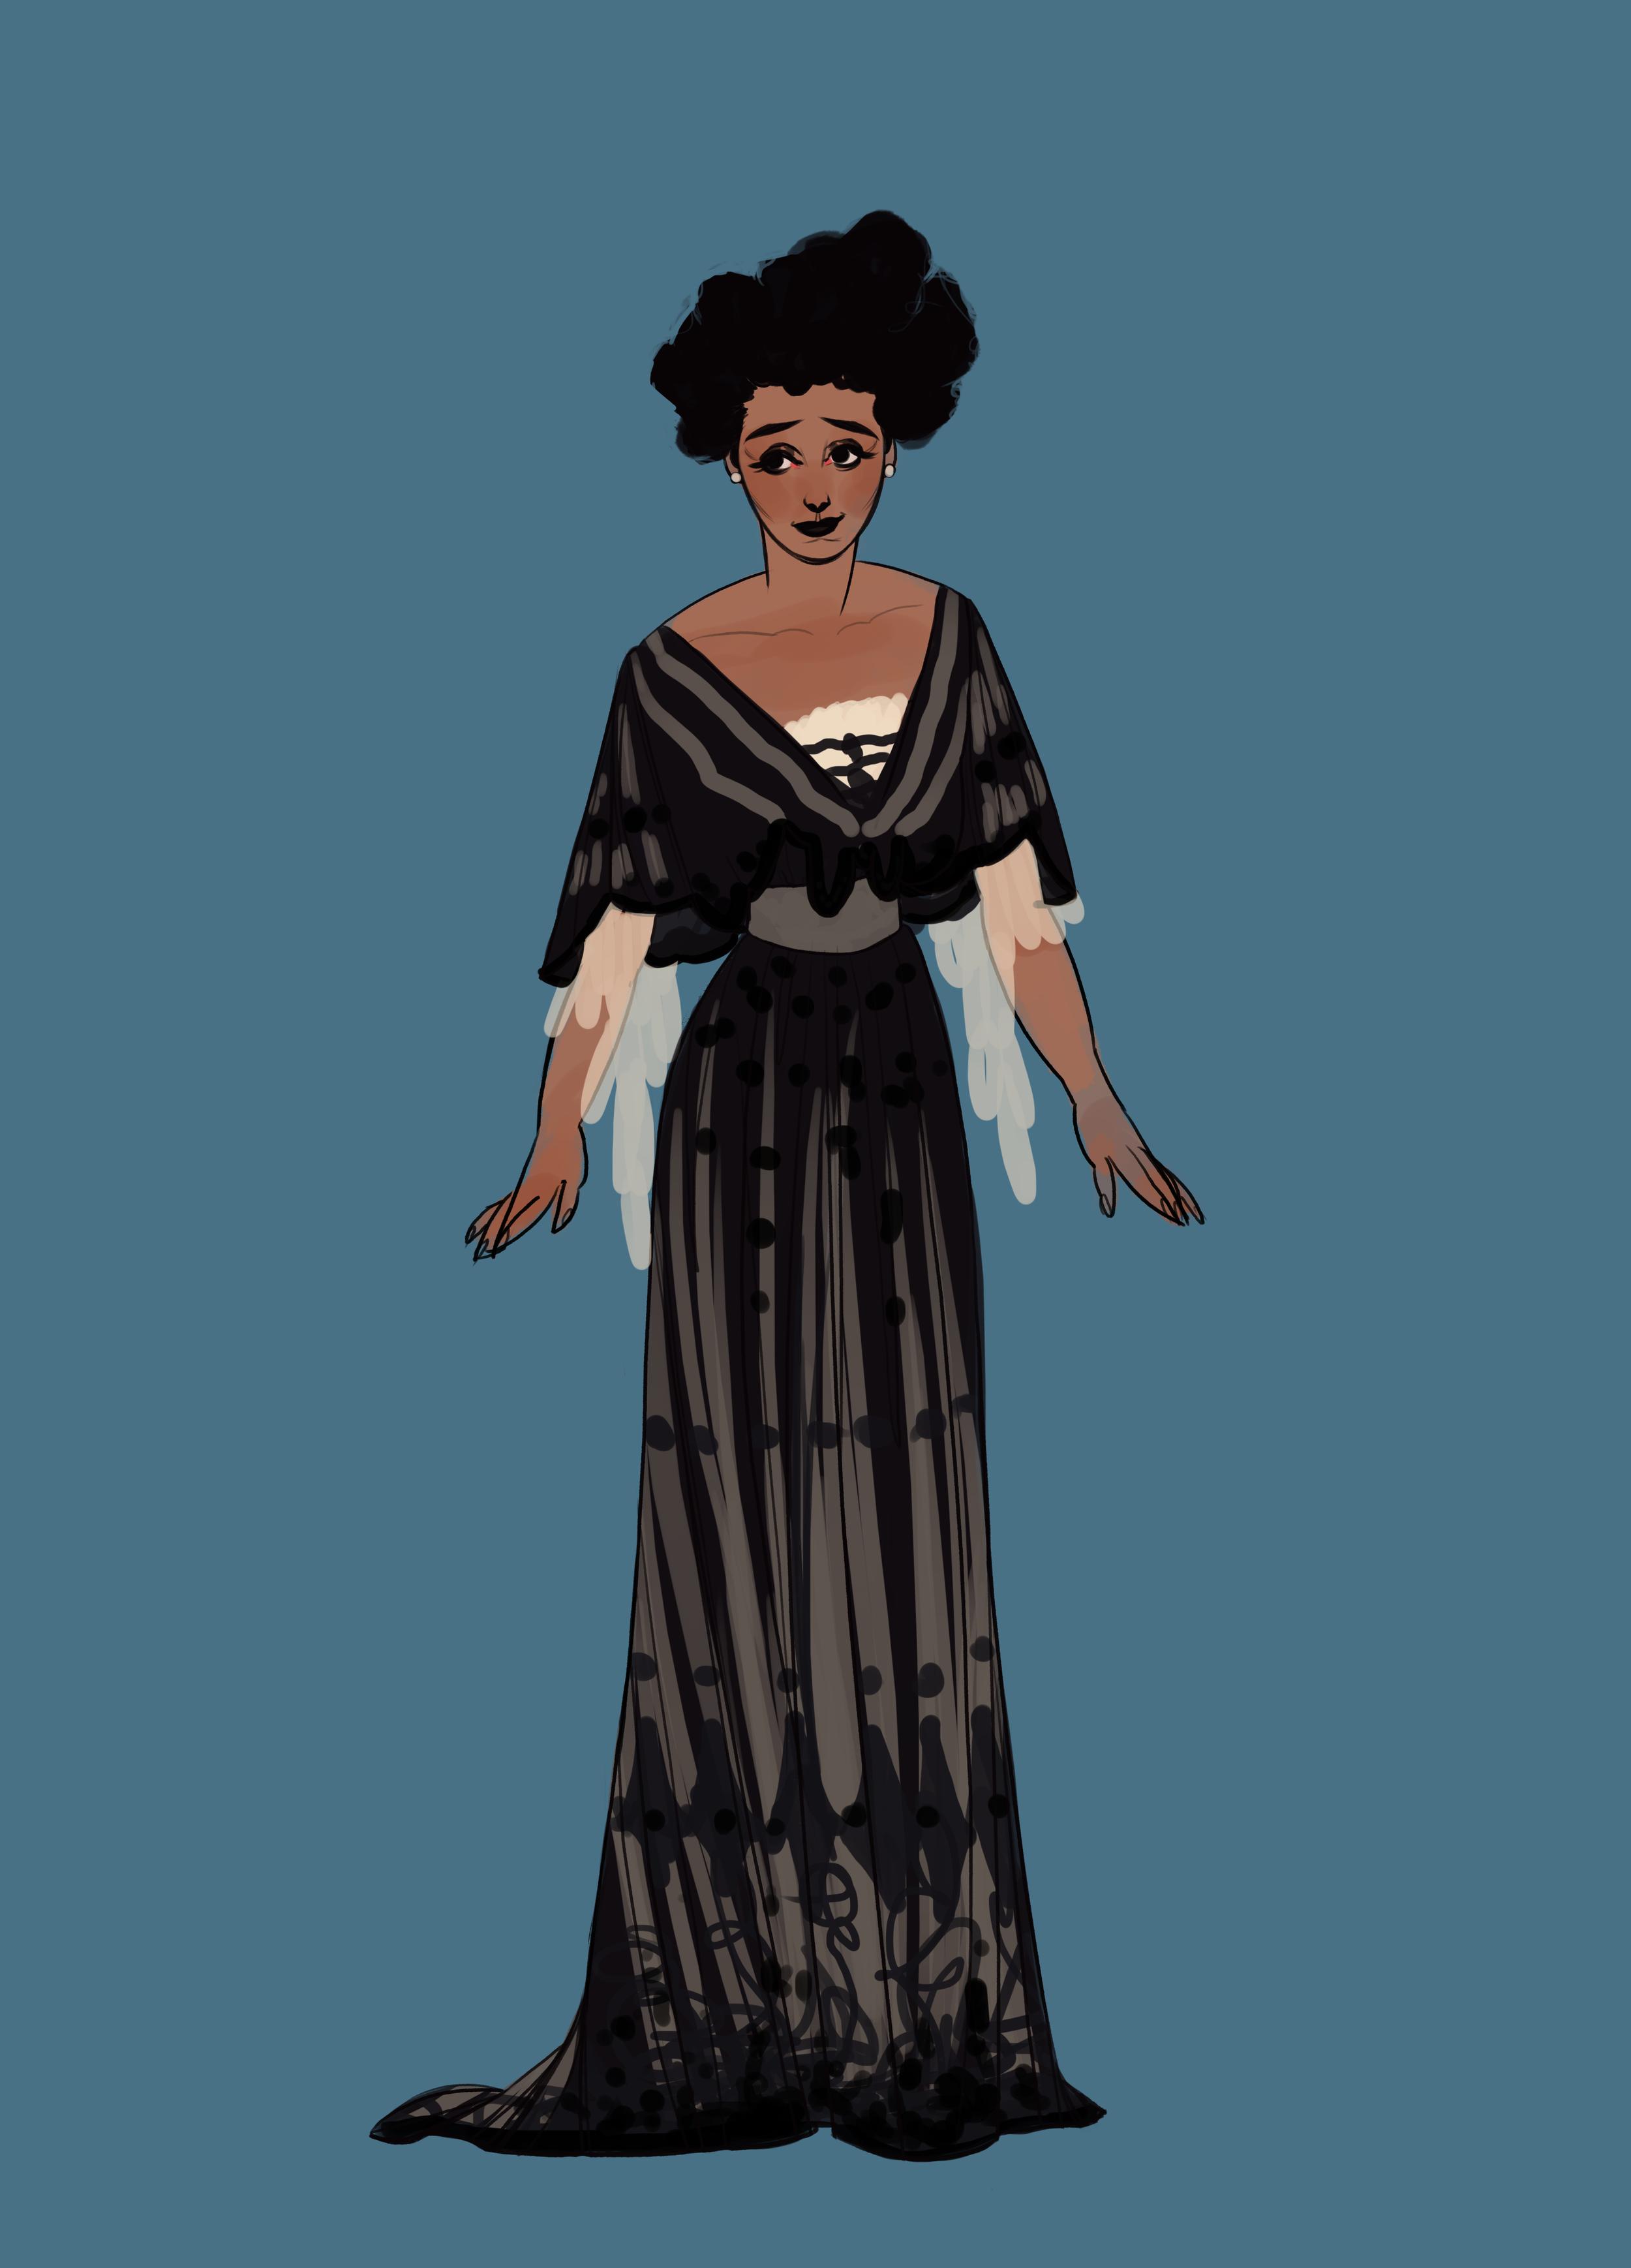 dress 3.png